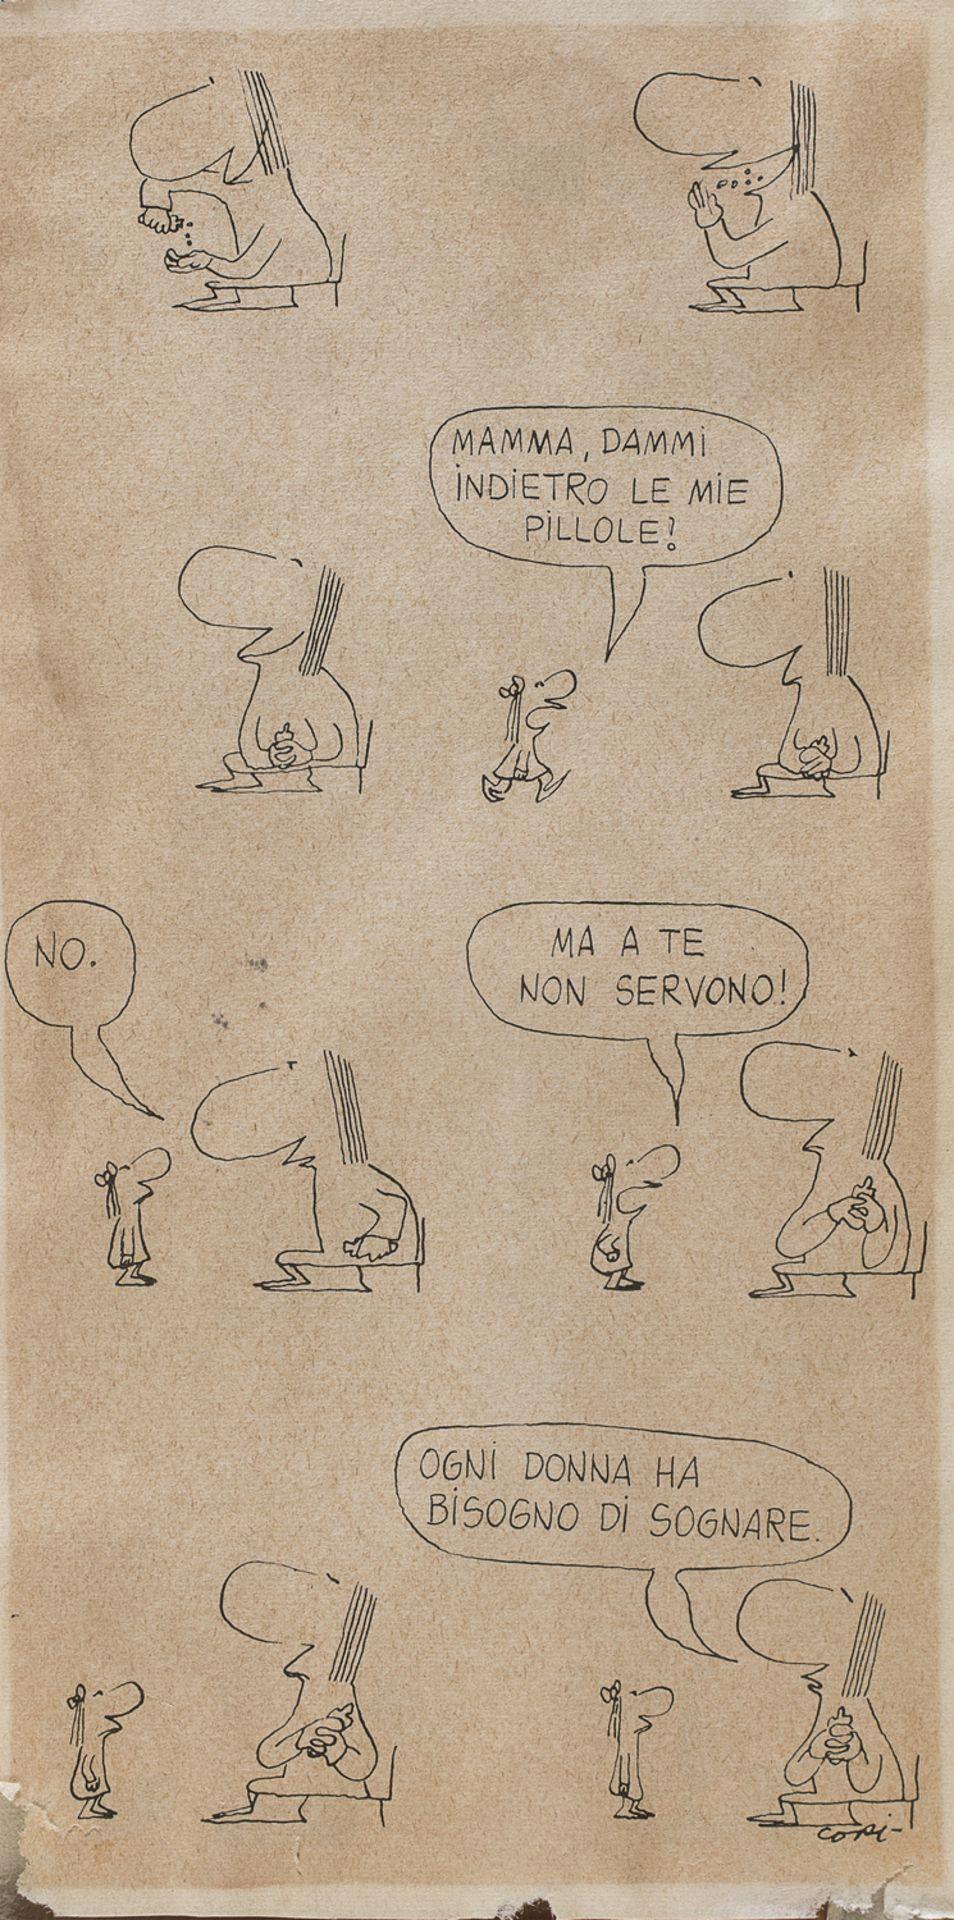 VIGNETTE BY RAUL DAMONTE BOTANA SAID COPI